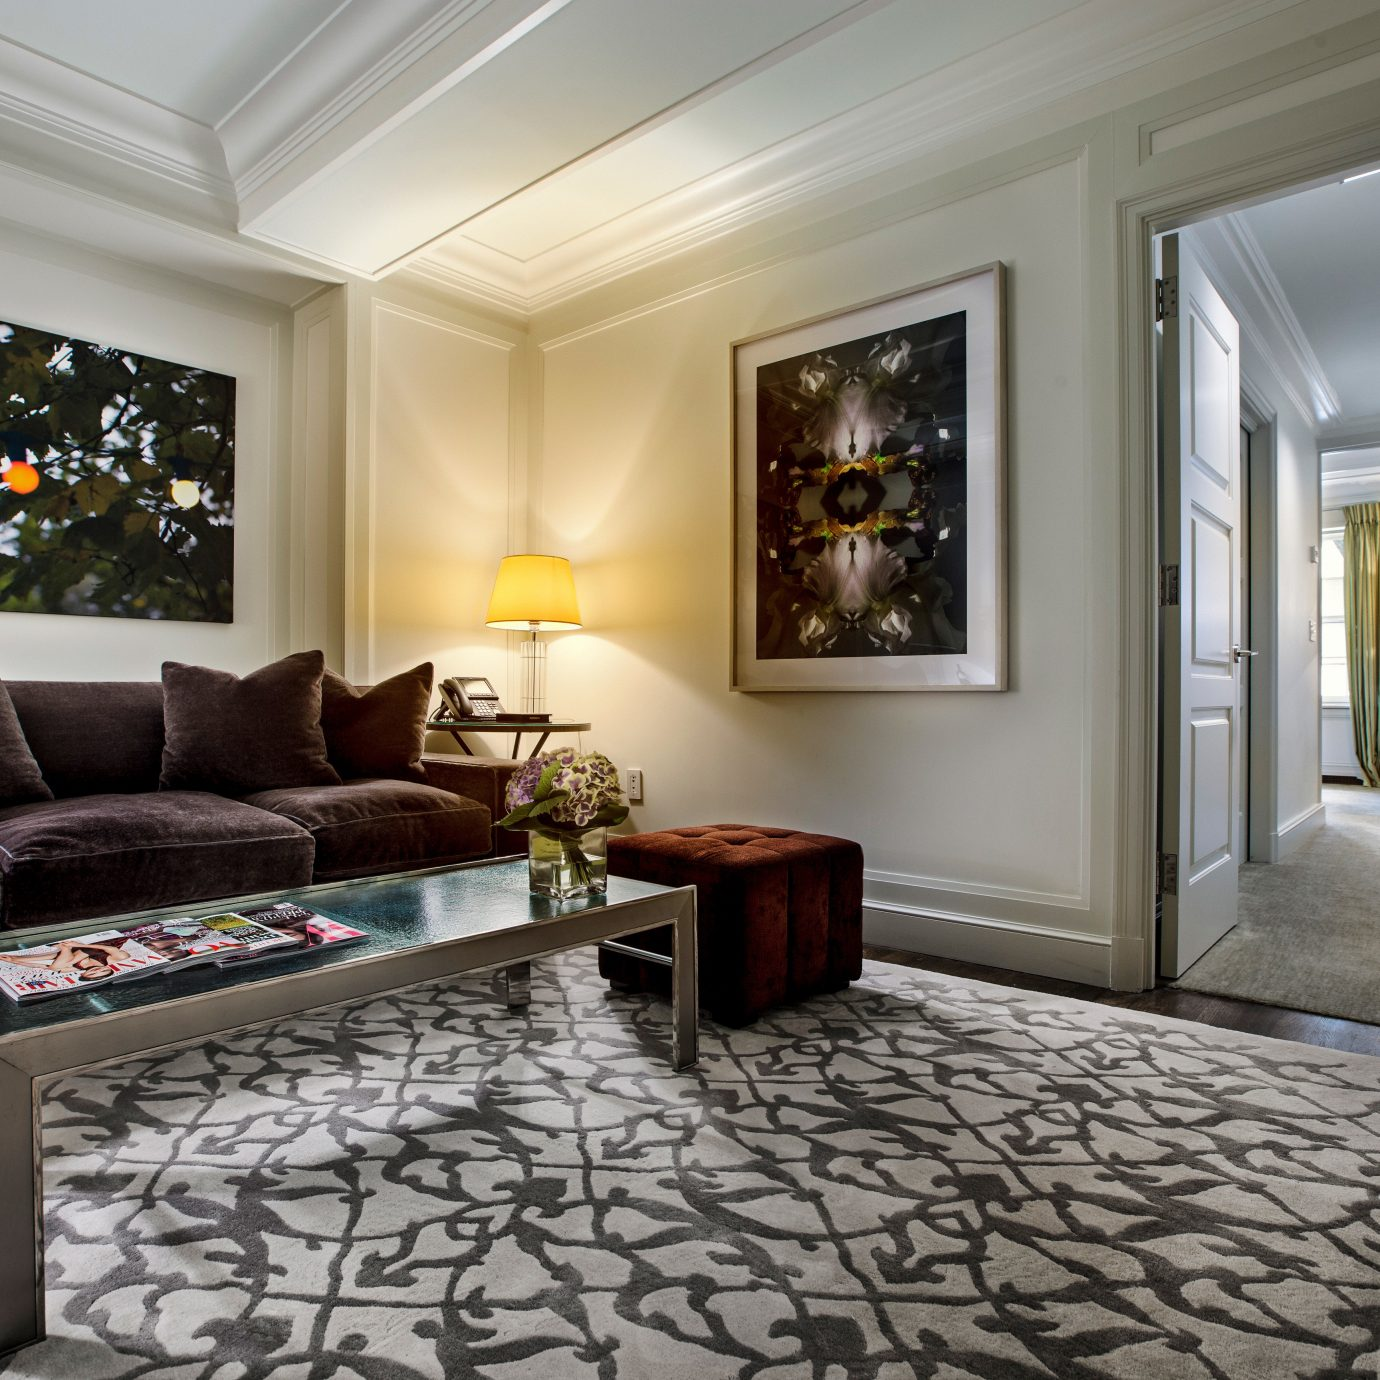 City Luxury Suite living room property home Bedroom mansion cottage condominium Villa